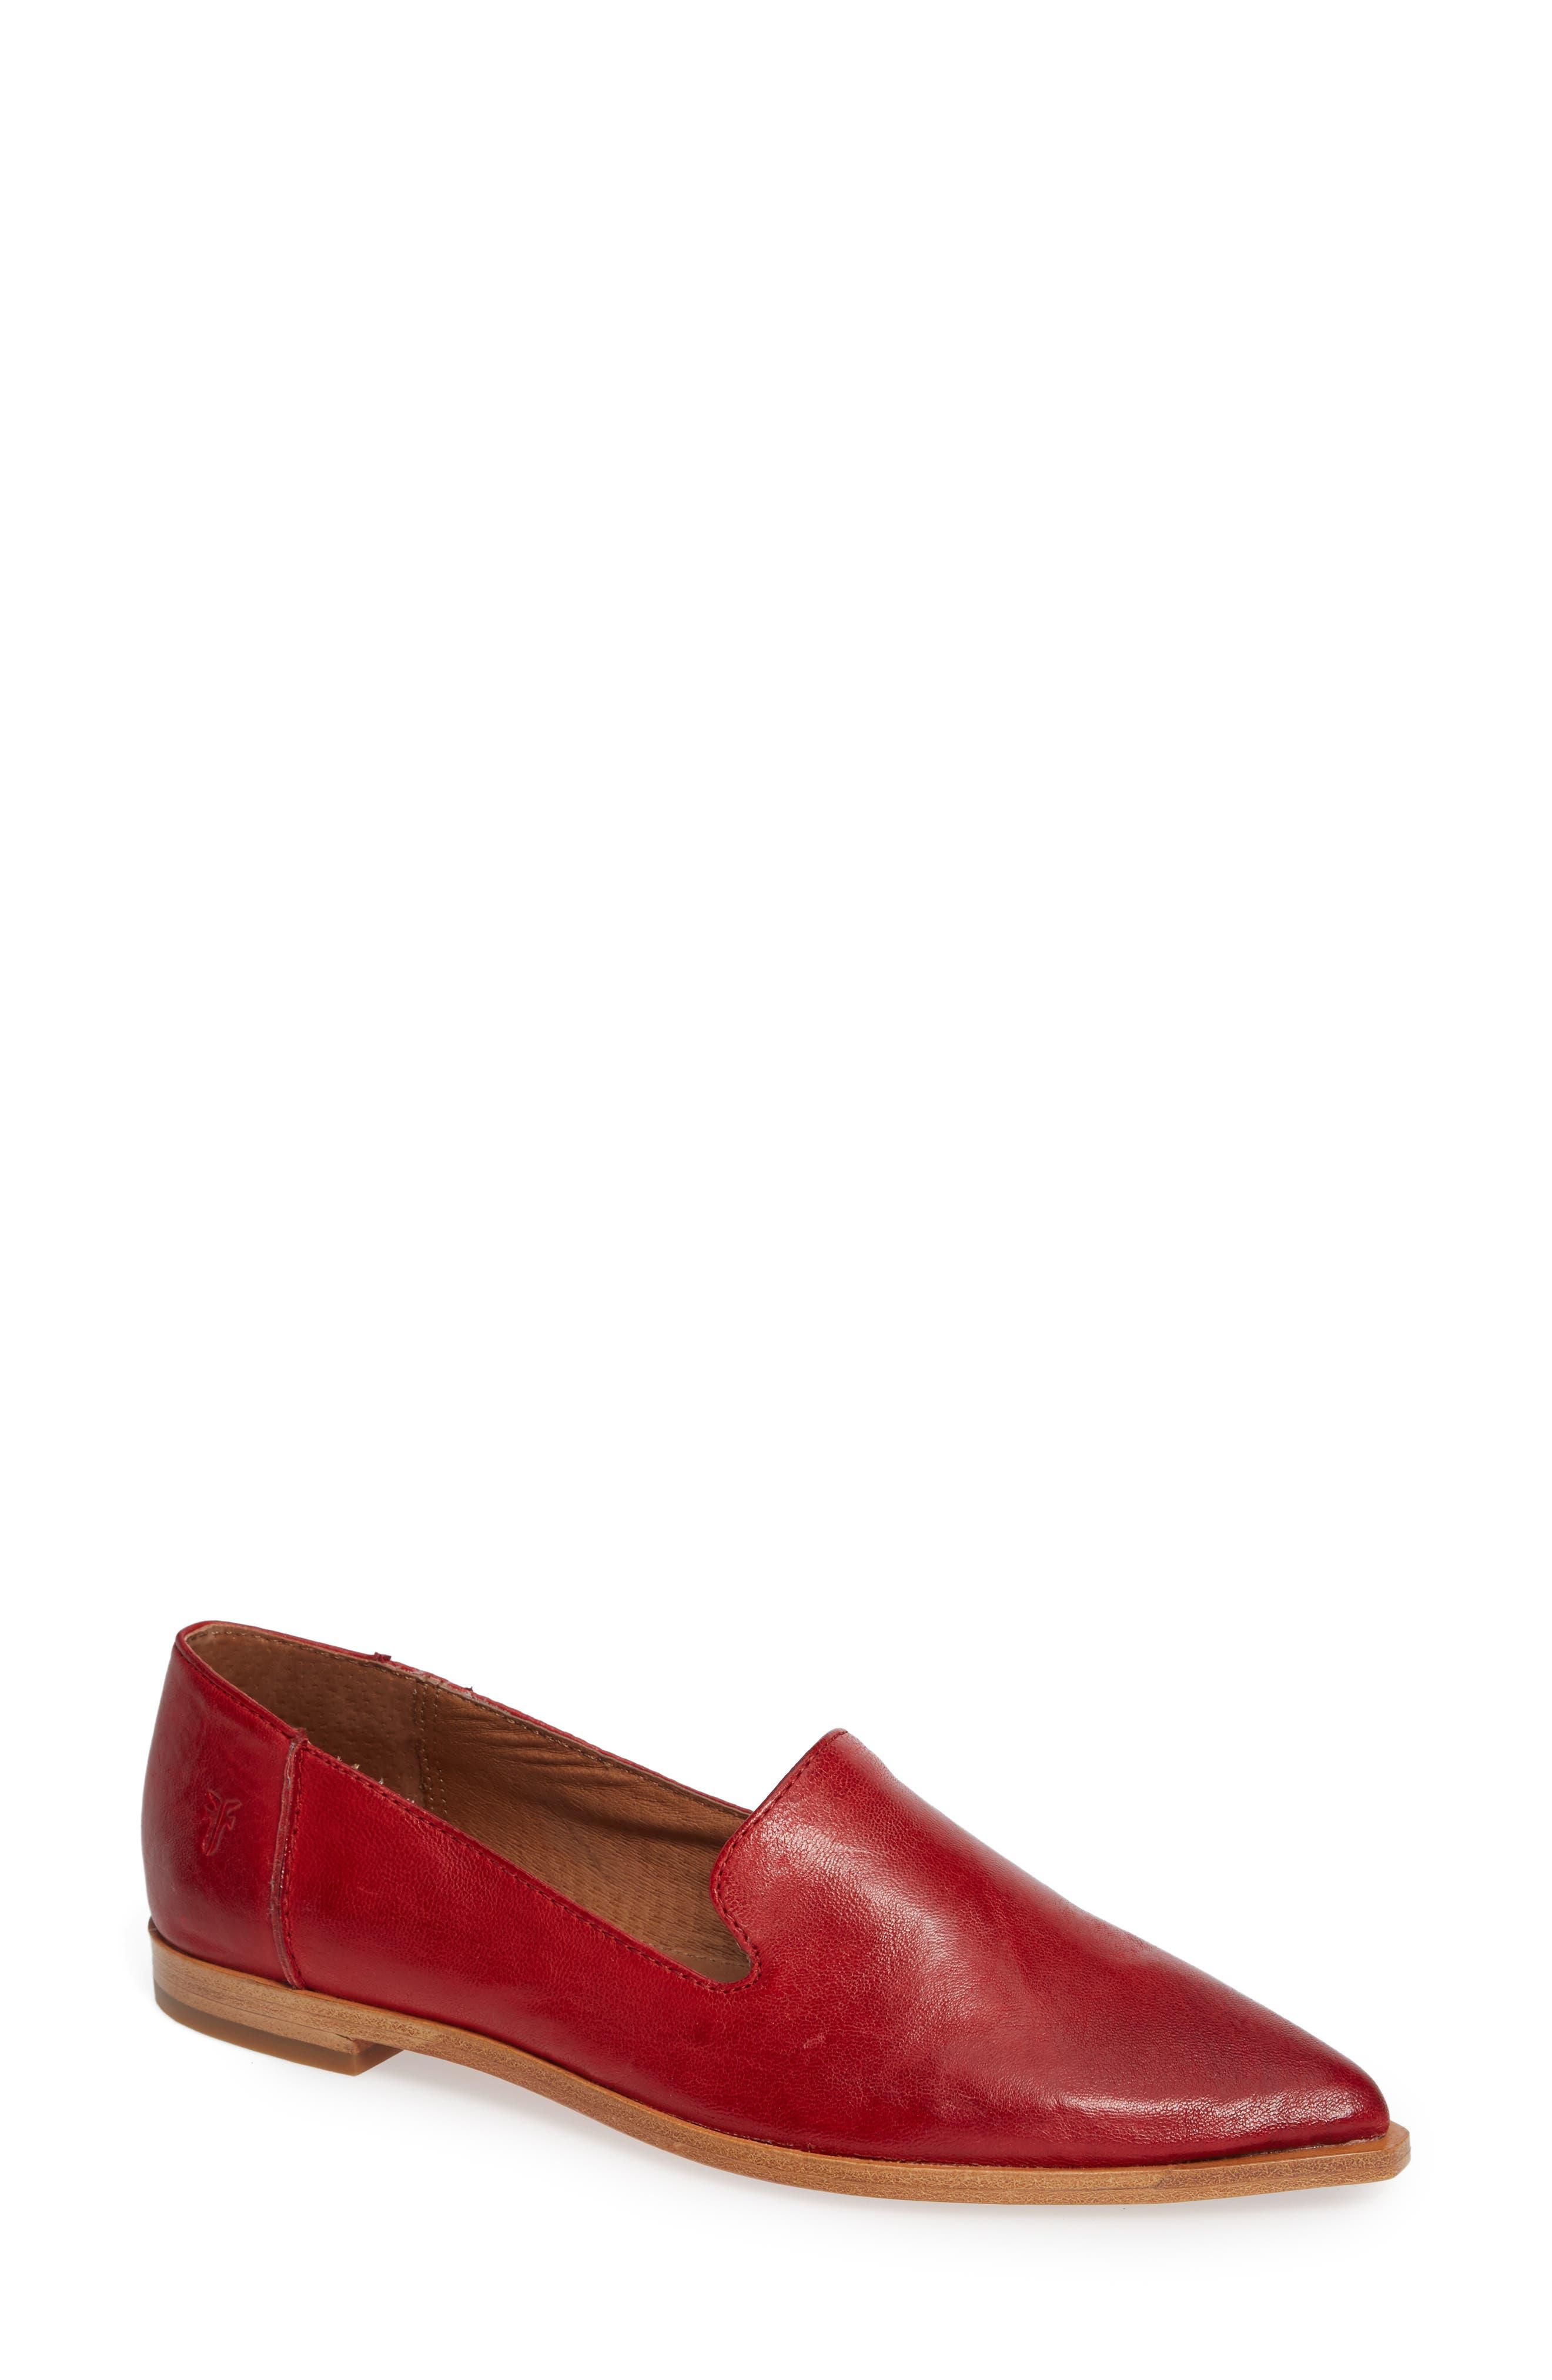 Kenzie Venetian Flat, Red Leather